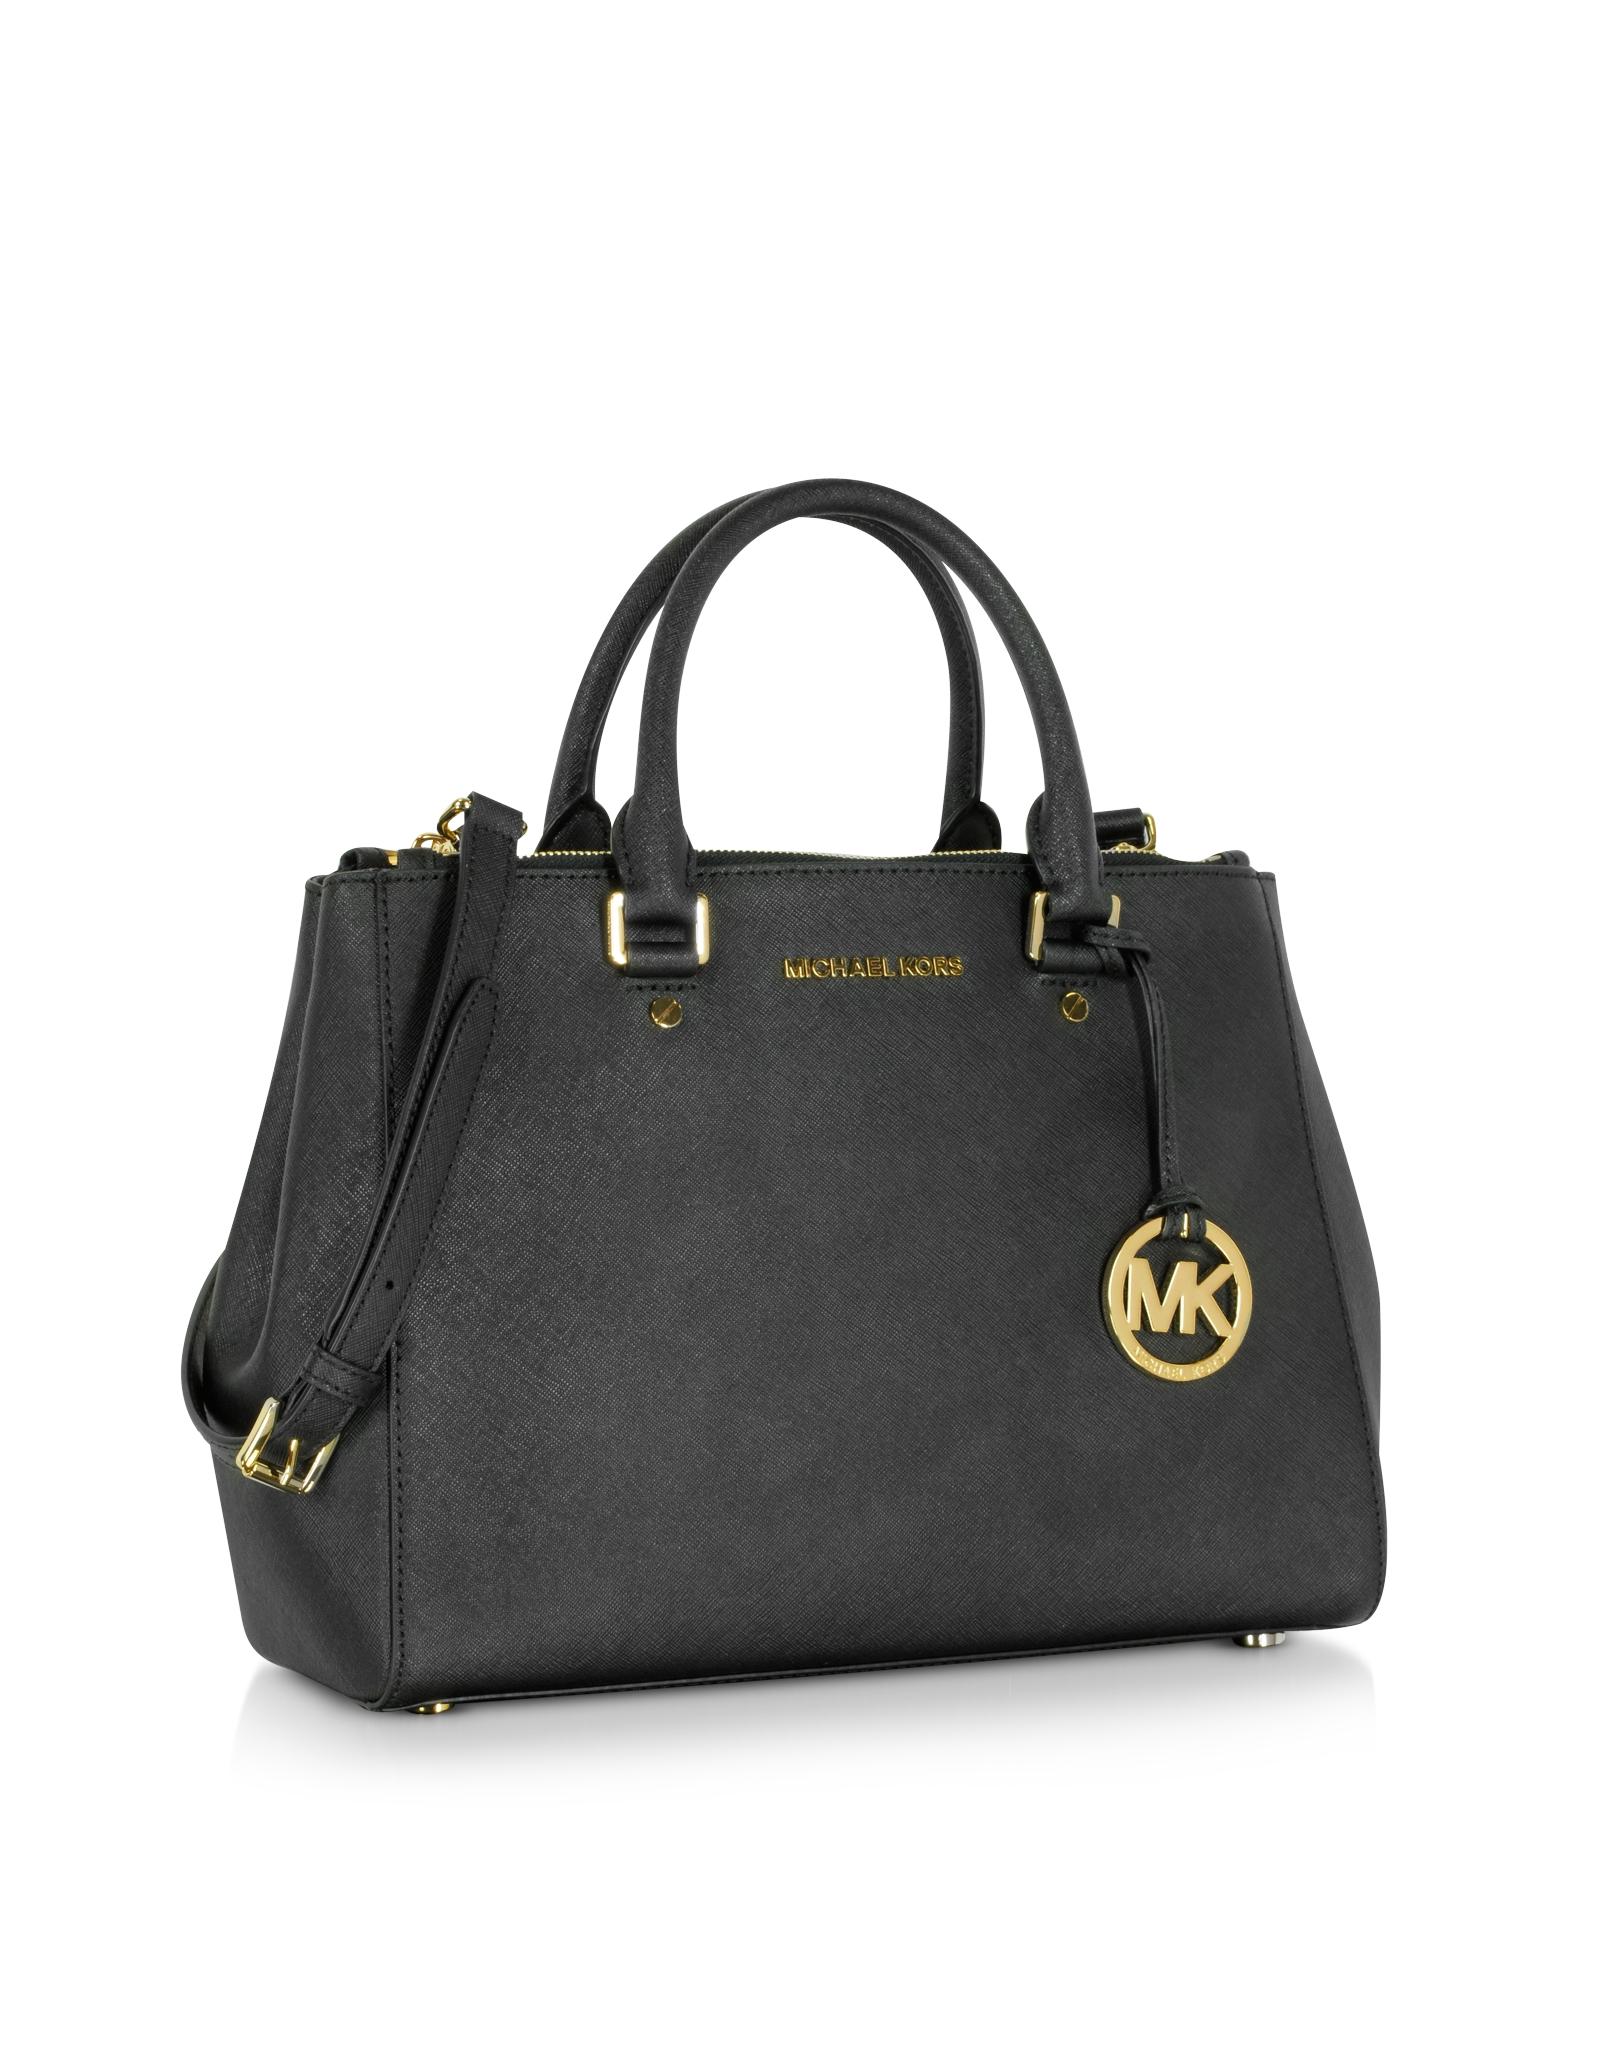 michael kors sutton medium saffiano leather satchel bag in. Black Bedroom Furniture Sets. Home Design Ideas